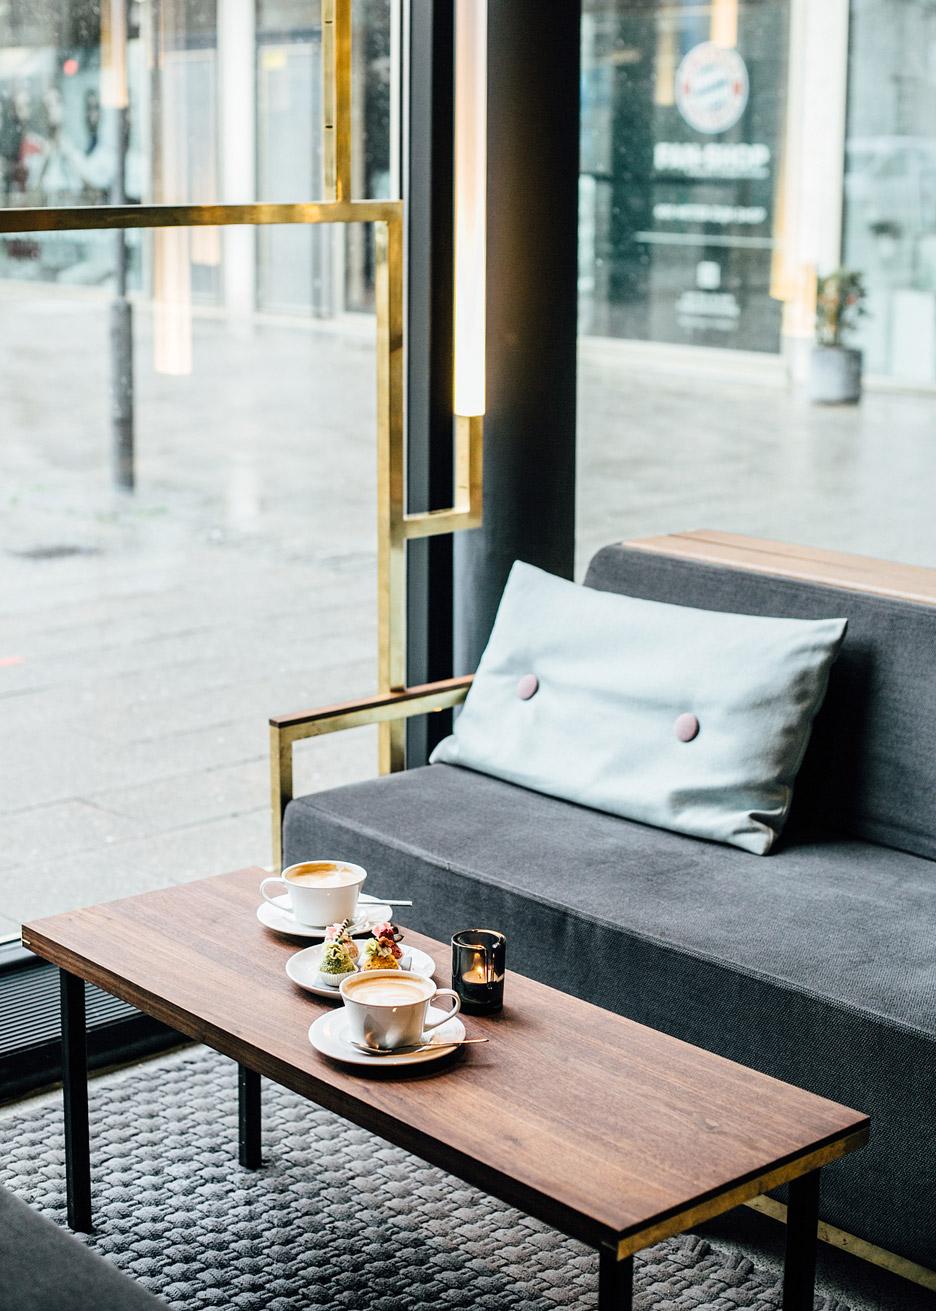 architecture_brass_vein_modern_residence_design_studia_interiors_osnovadesign_osnova_poltava_07